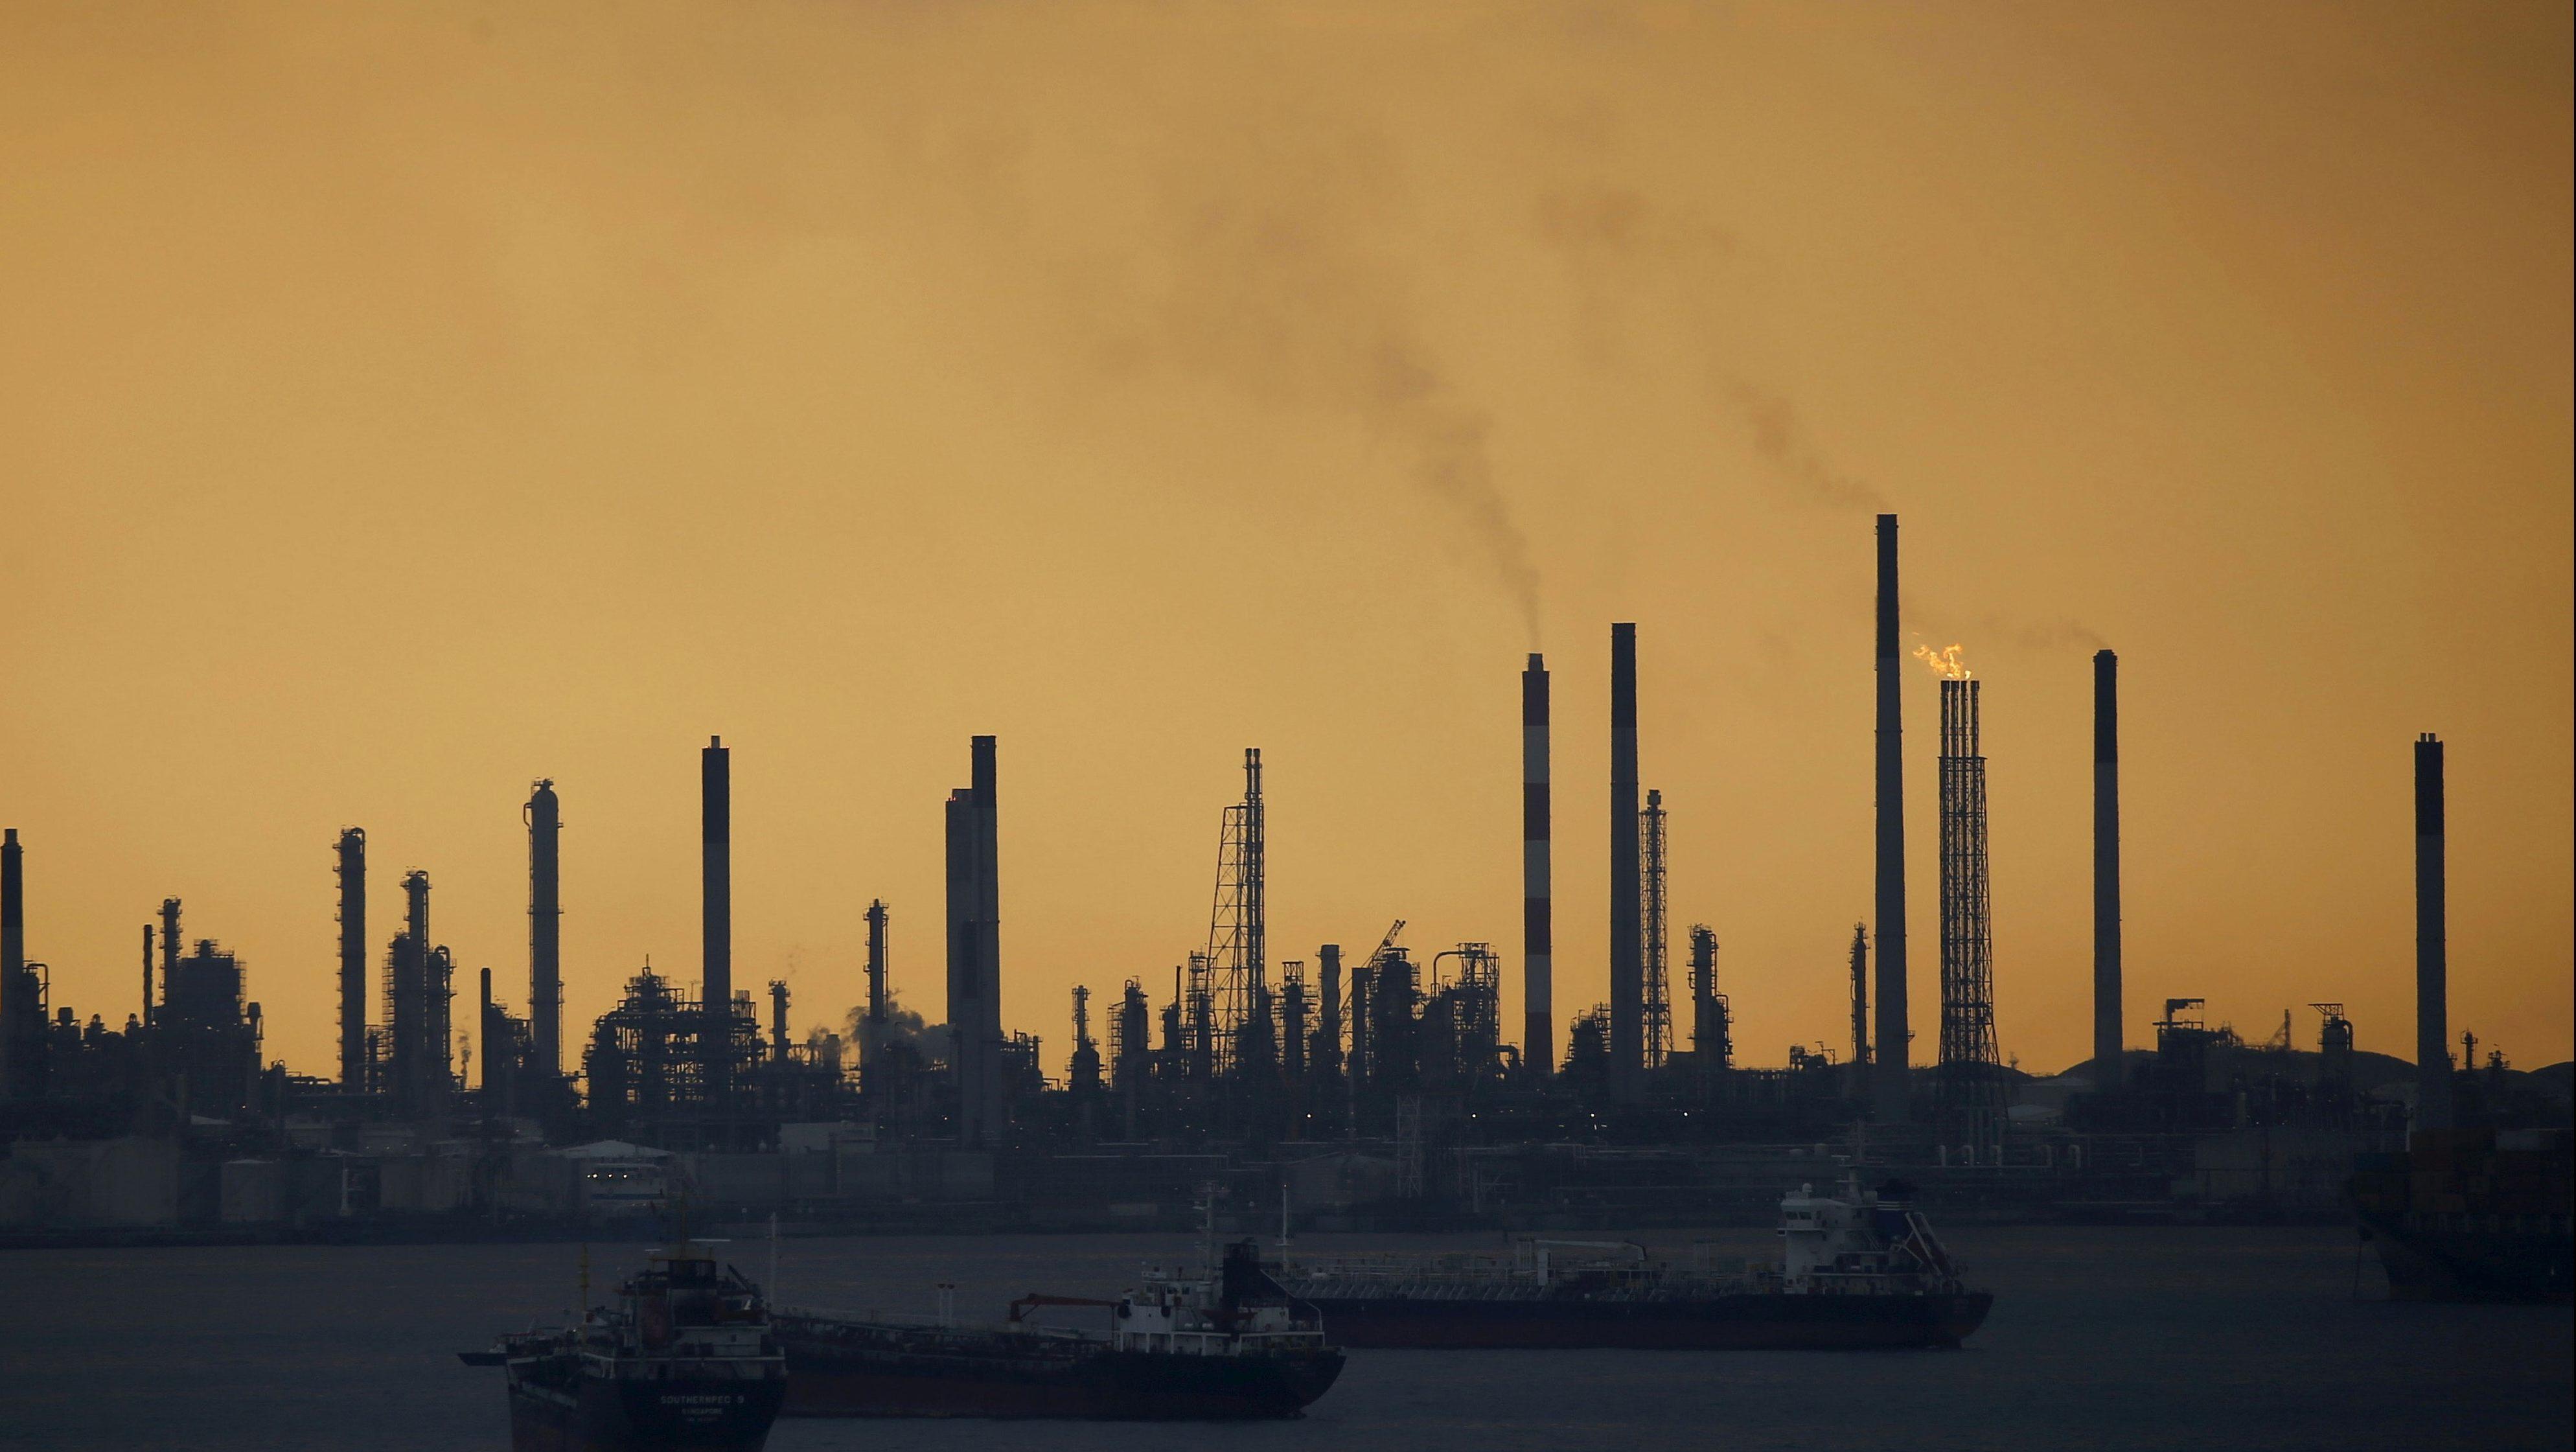 Pricing carbon is not enough to stop climate change - Quartz